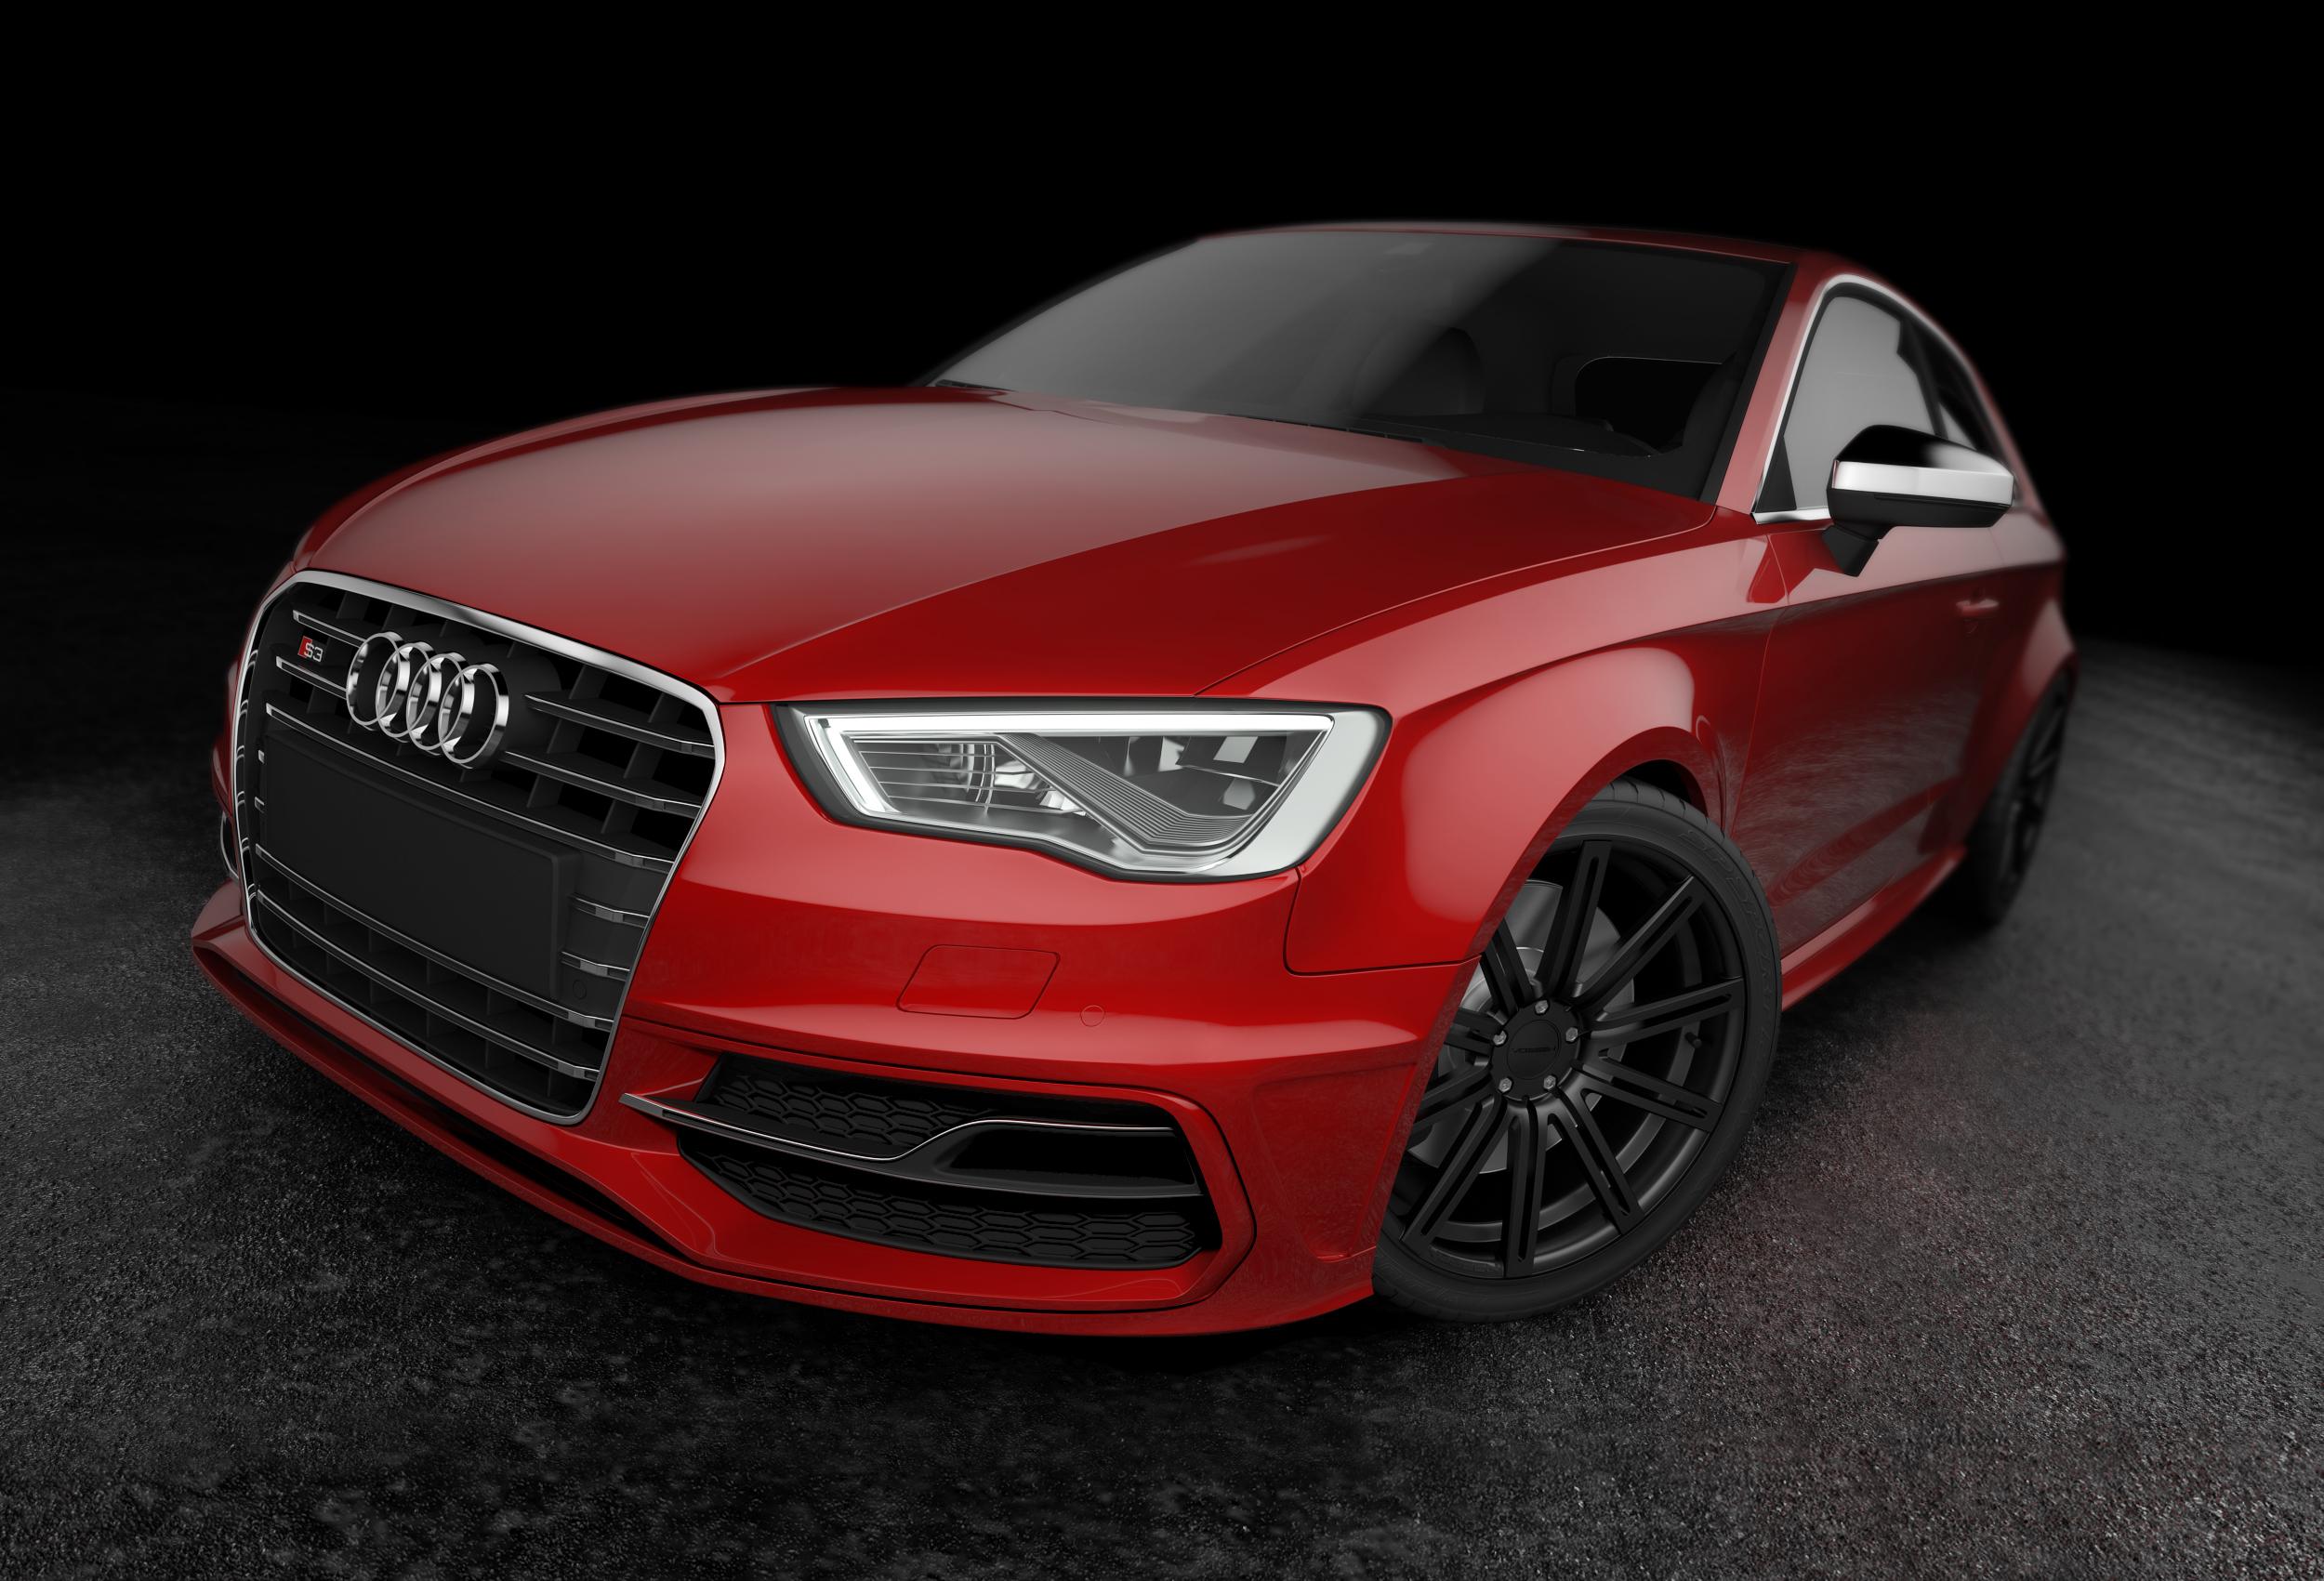 Dripmoon Studio 3D Tours - Design Automobile